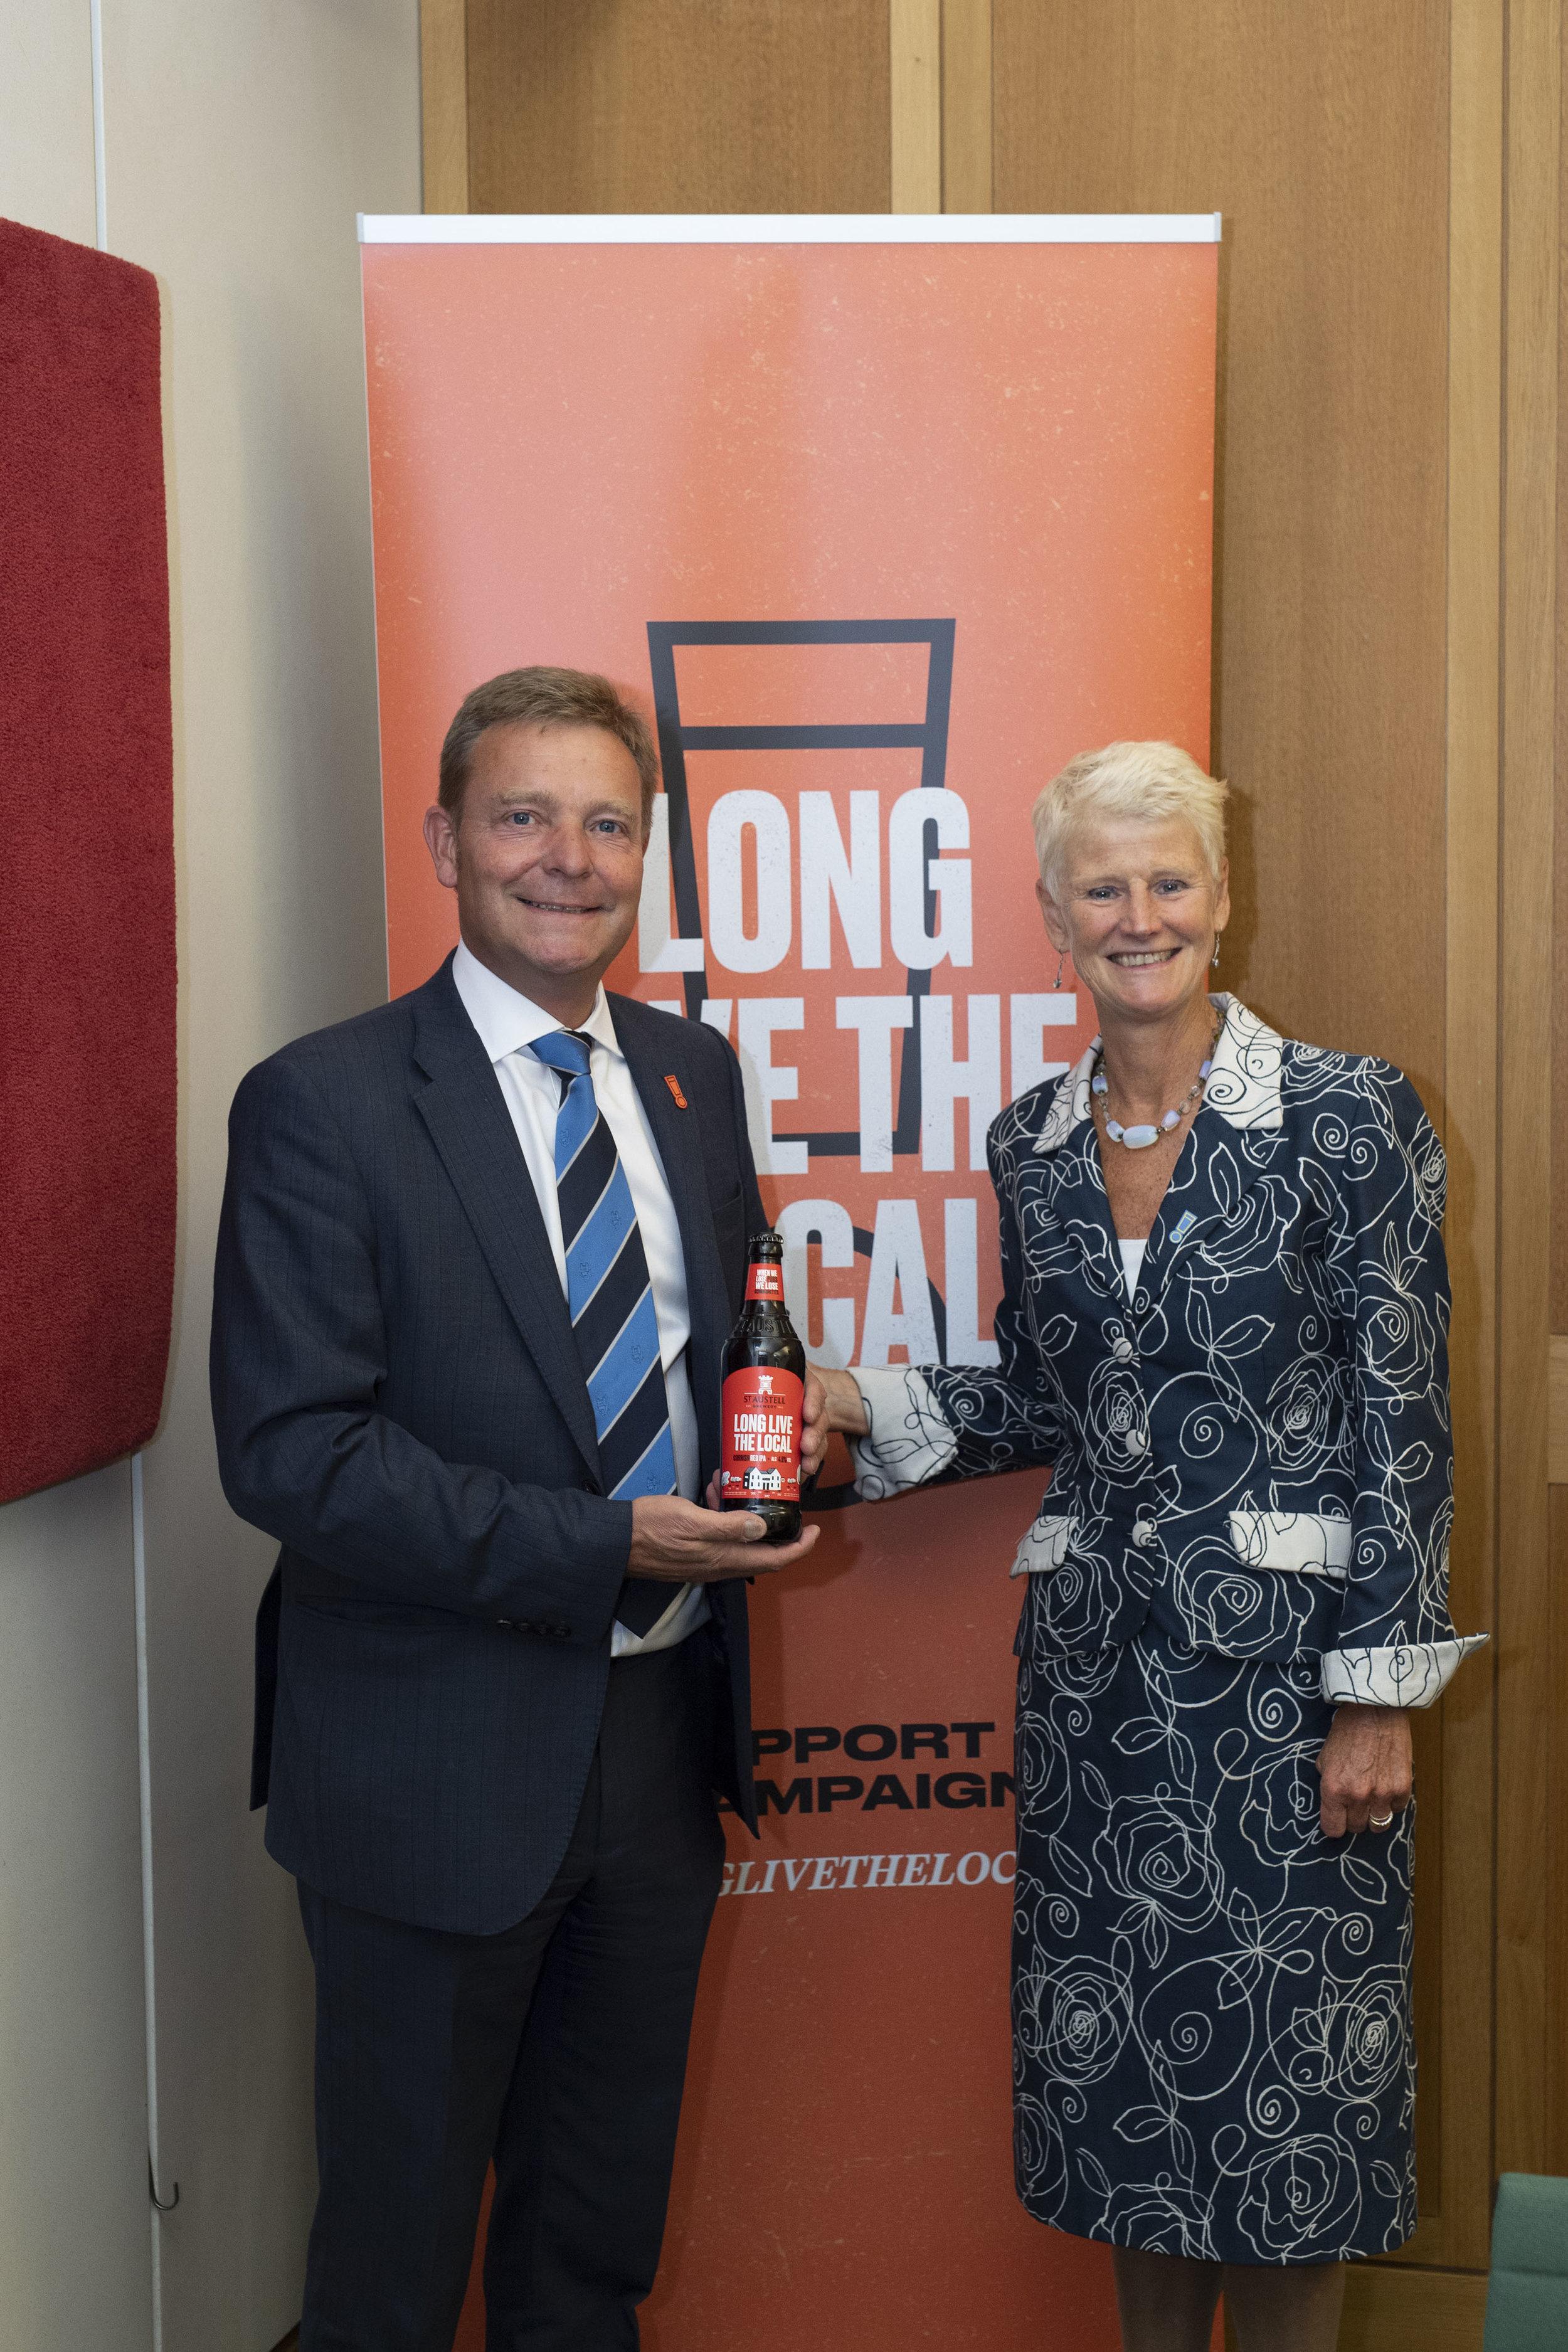 Craig with Brigid Simmonds, the Chief Executive of the British Beer & Pub Association